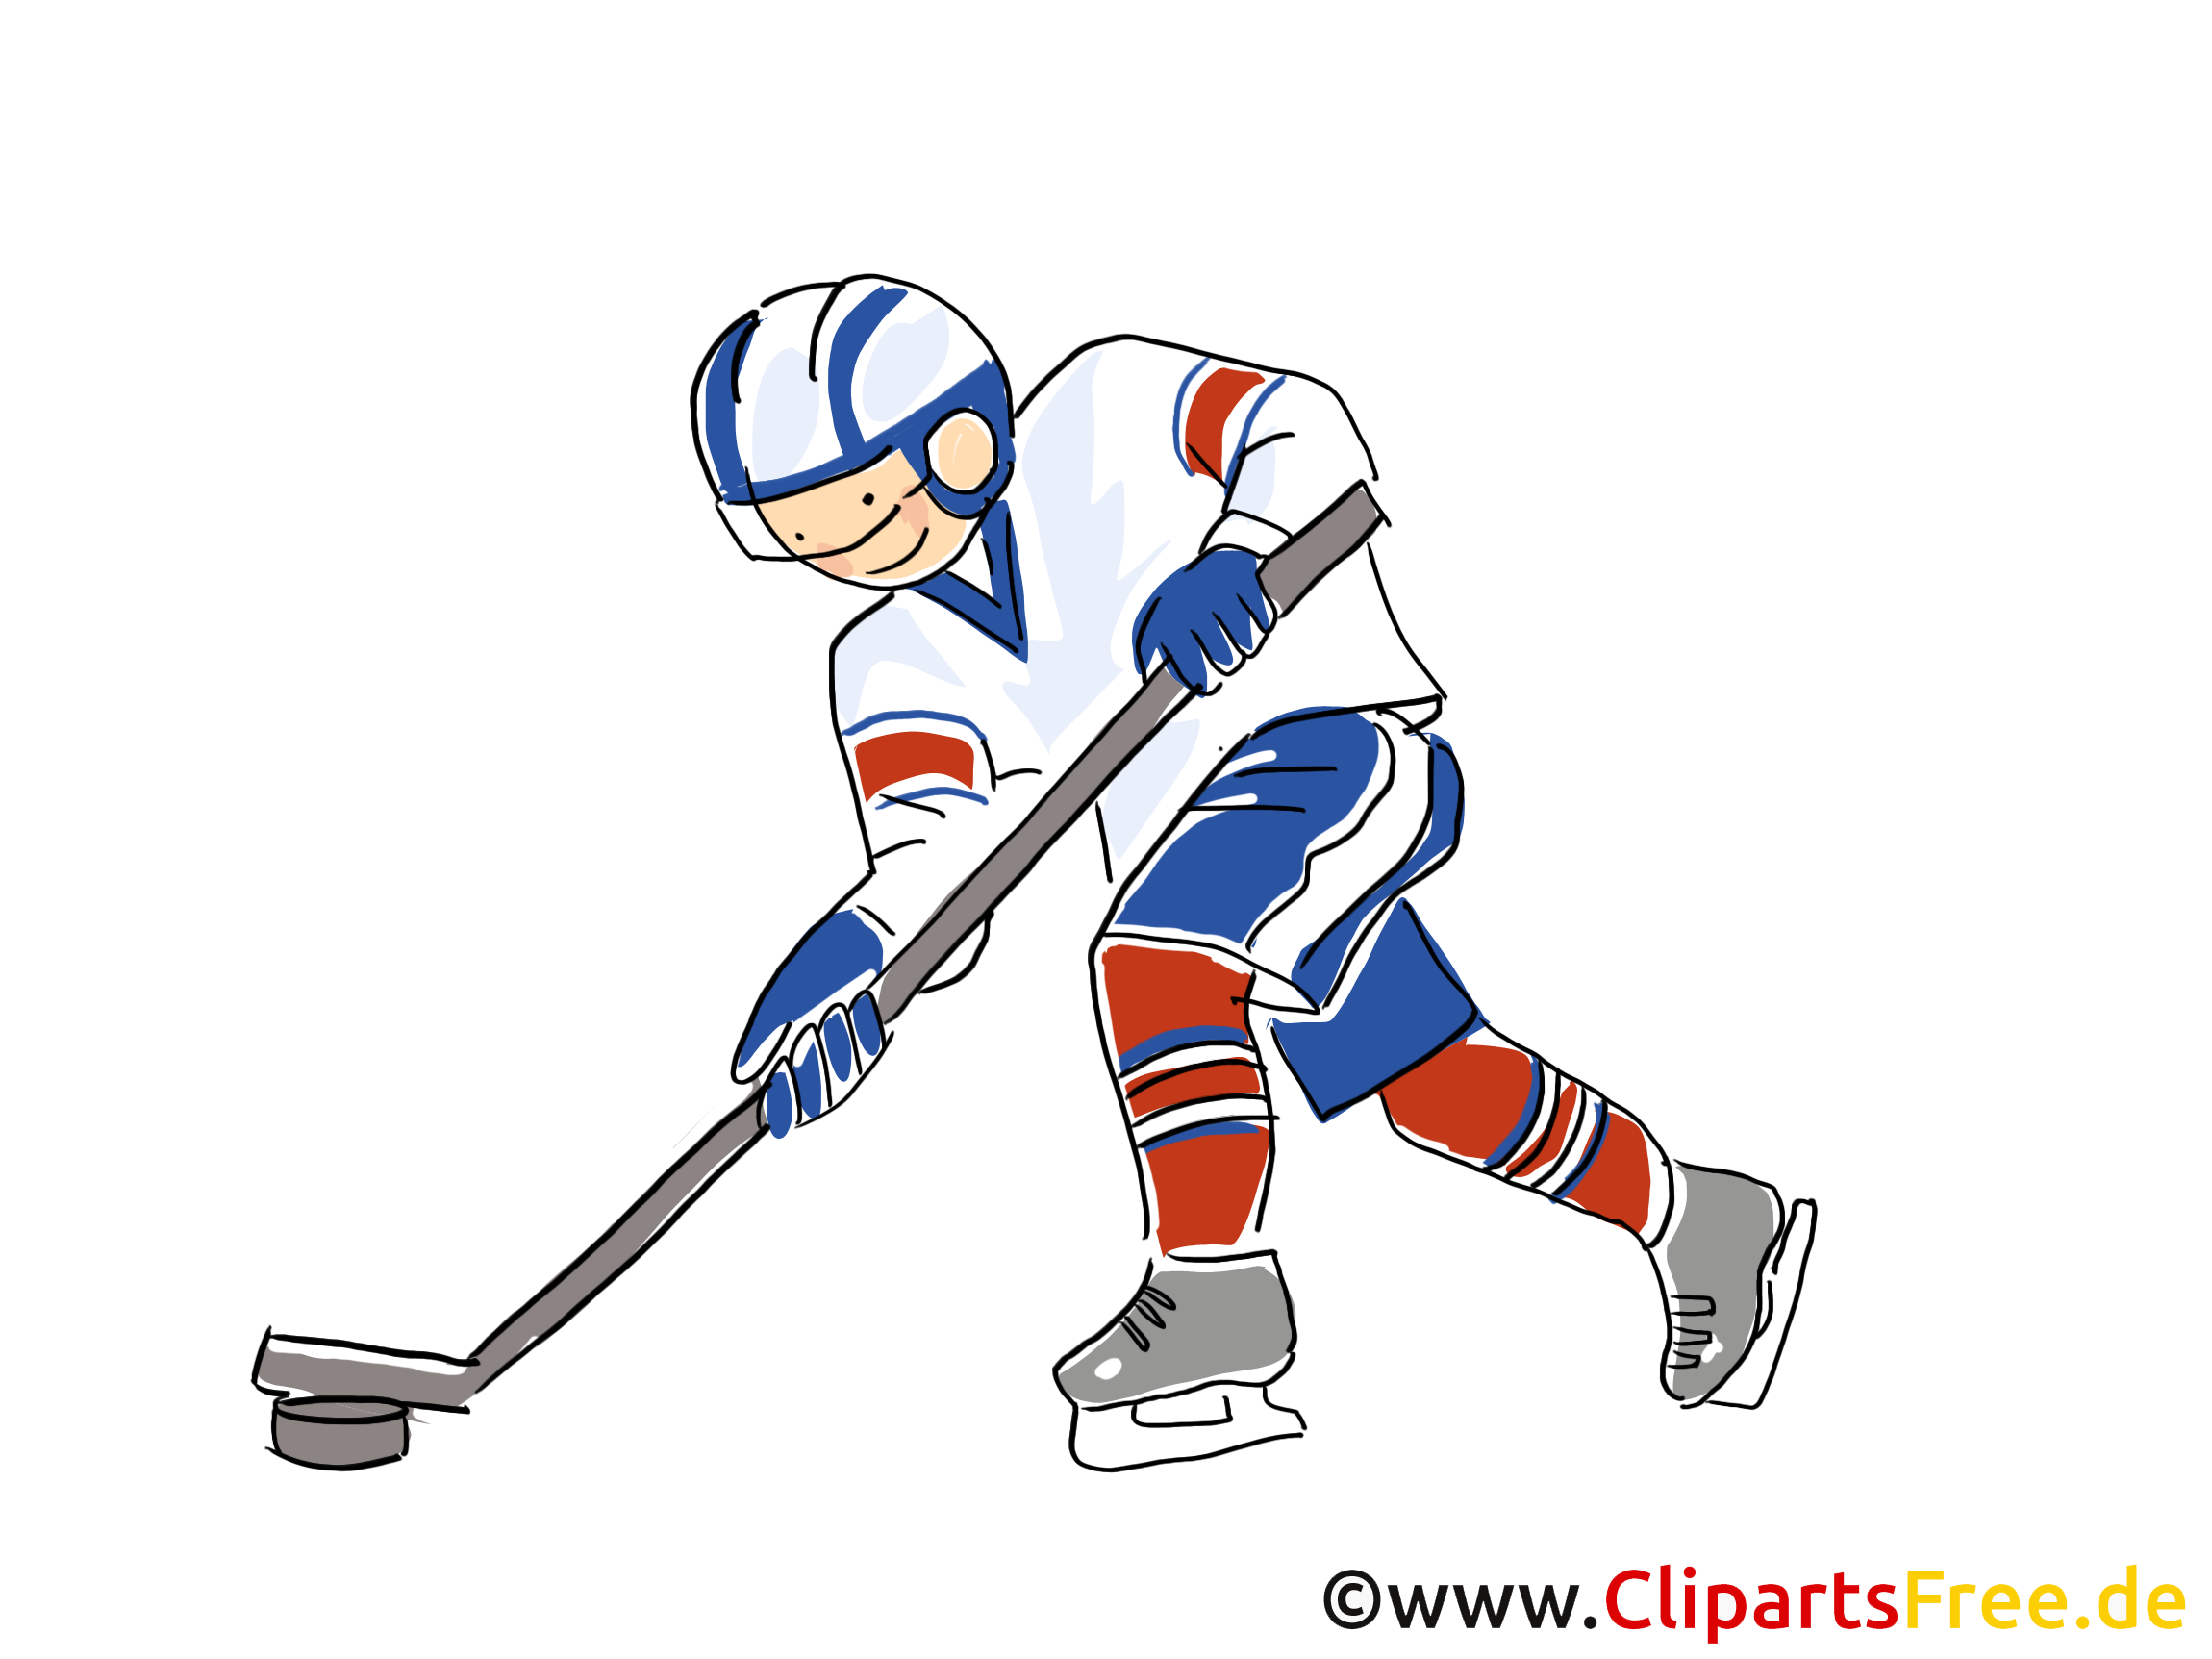 Palet dessin hockey clip arts gratuits hockey sur glace dessin picture image graphic - Dessin hockey sur glace ...